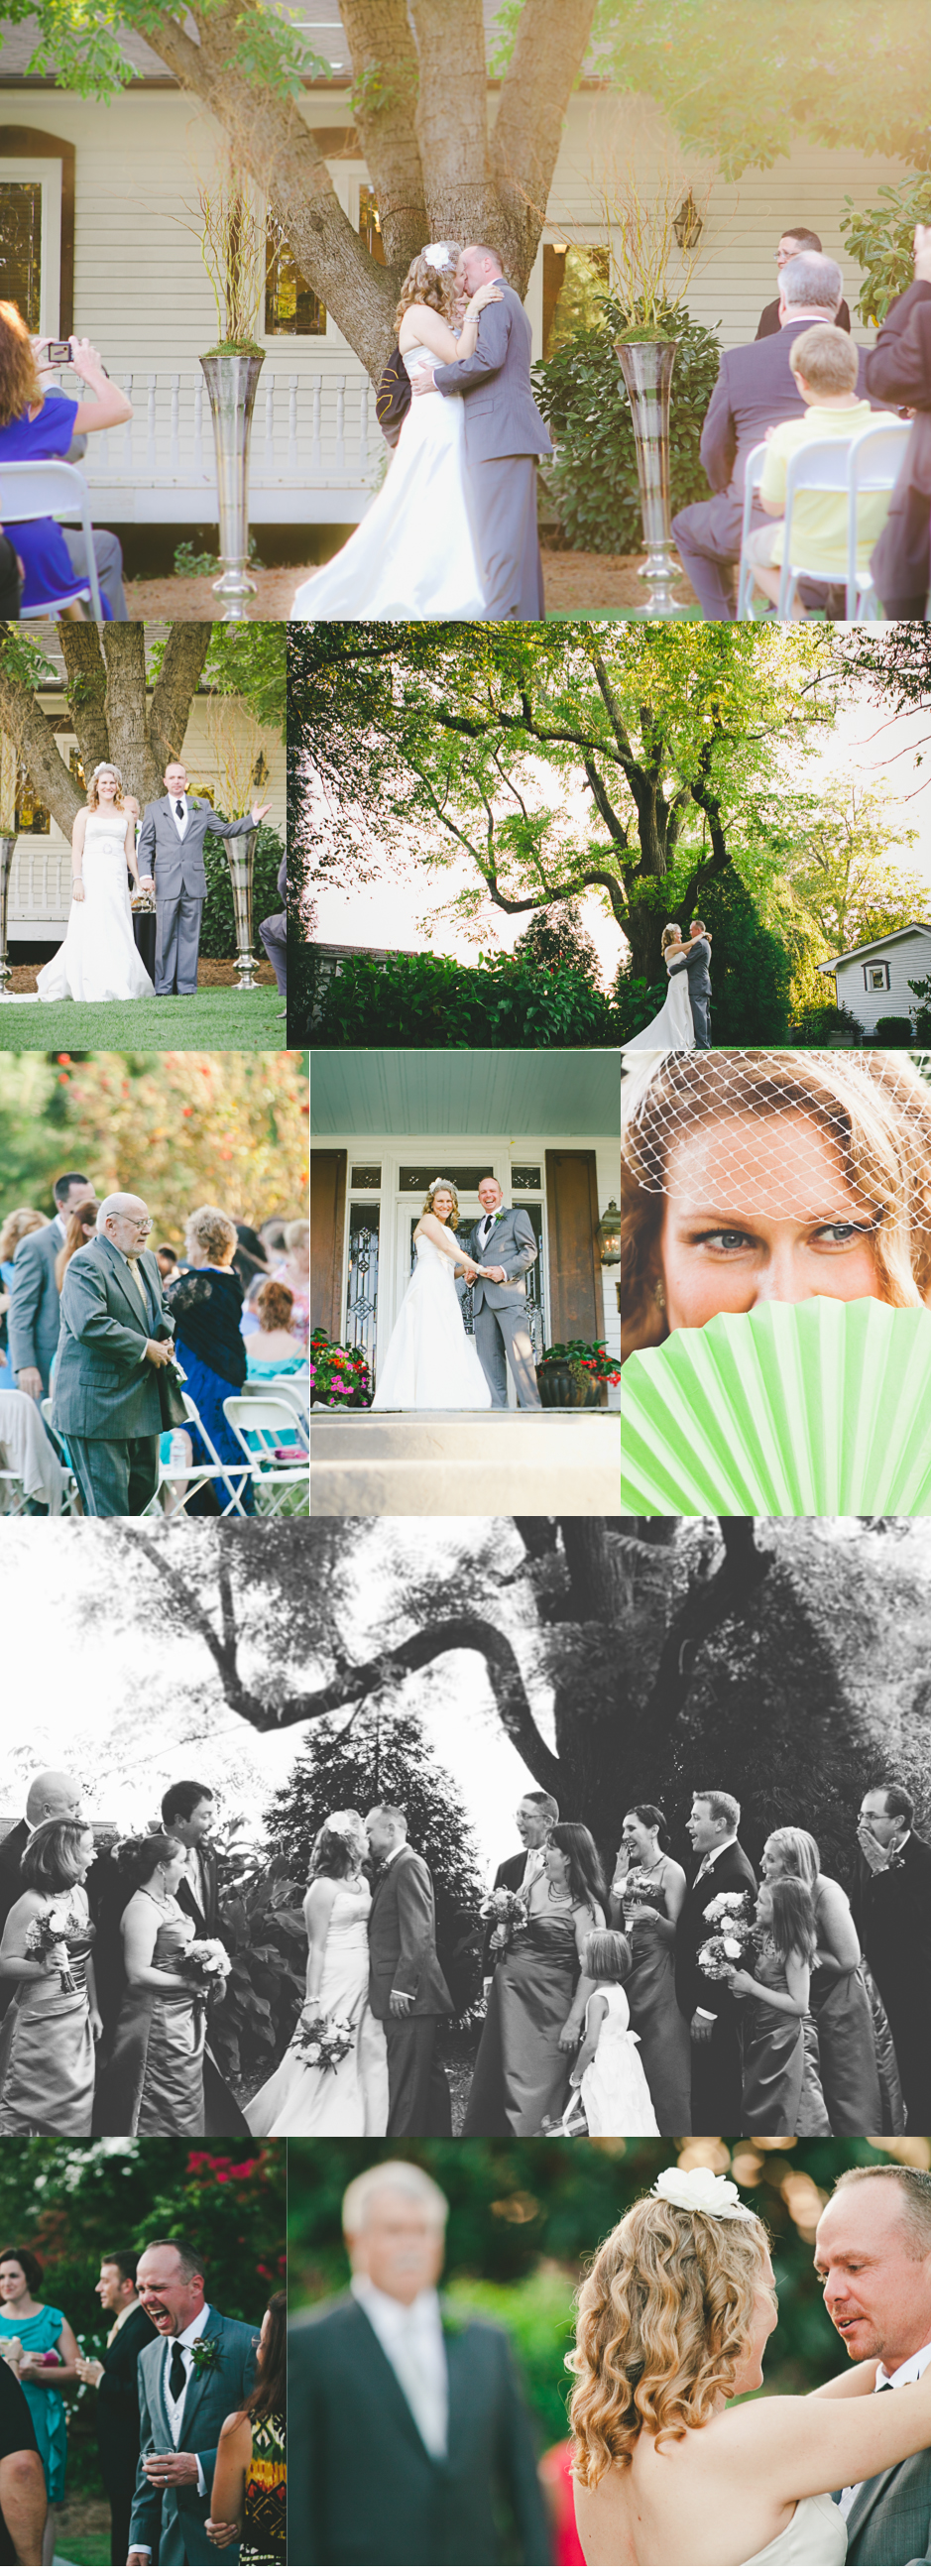 FrecklesAndLocks20120811_AmandaChris_Wedding_Collage1-2